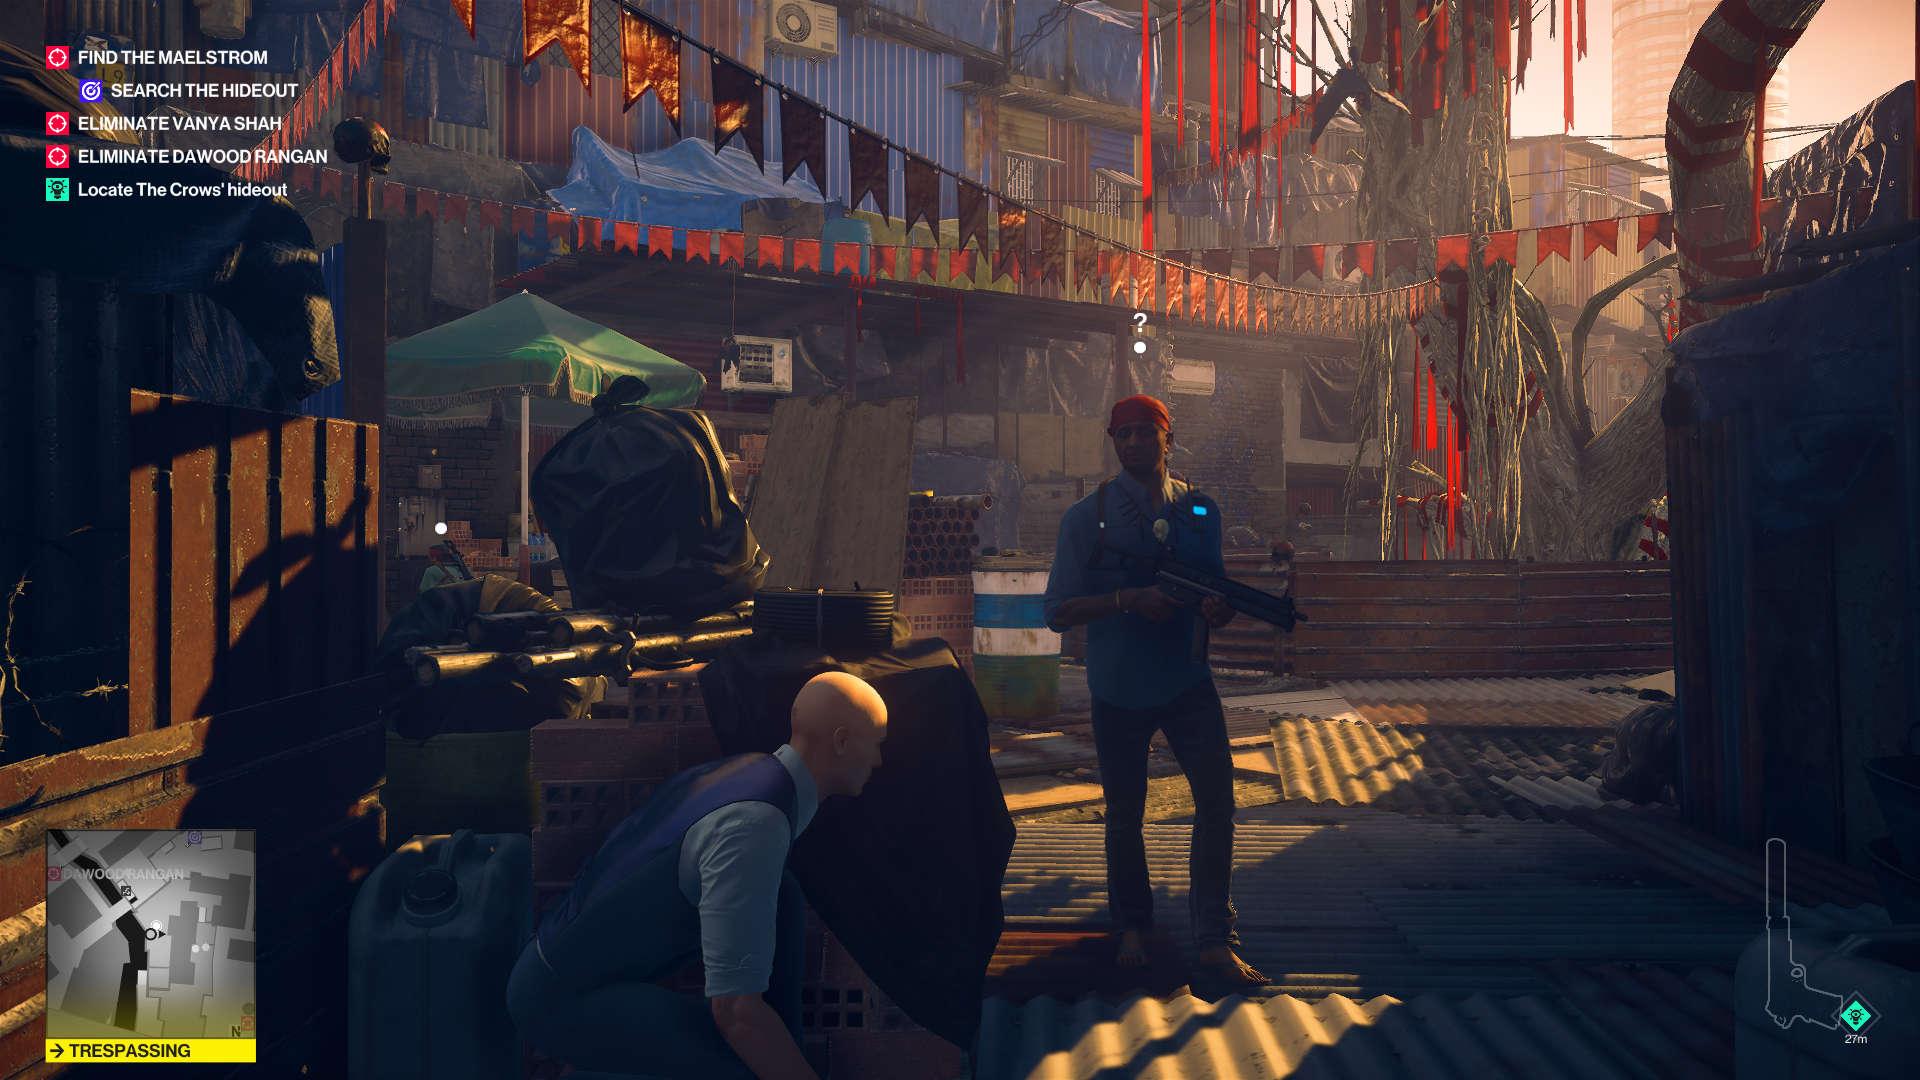 Hitman 2 PC review – an expansive, astonishing sandbox